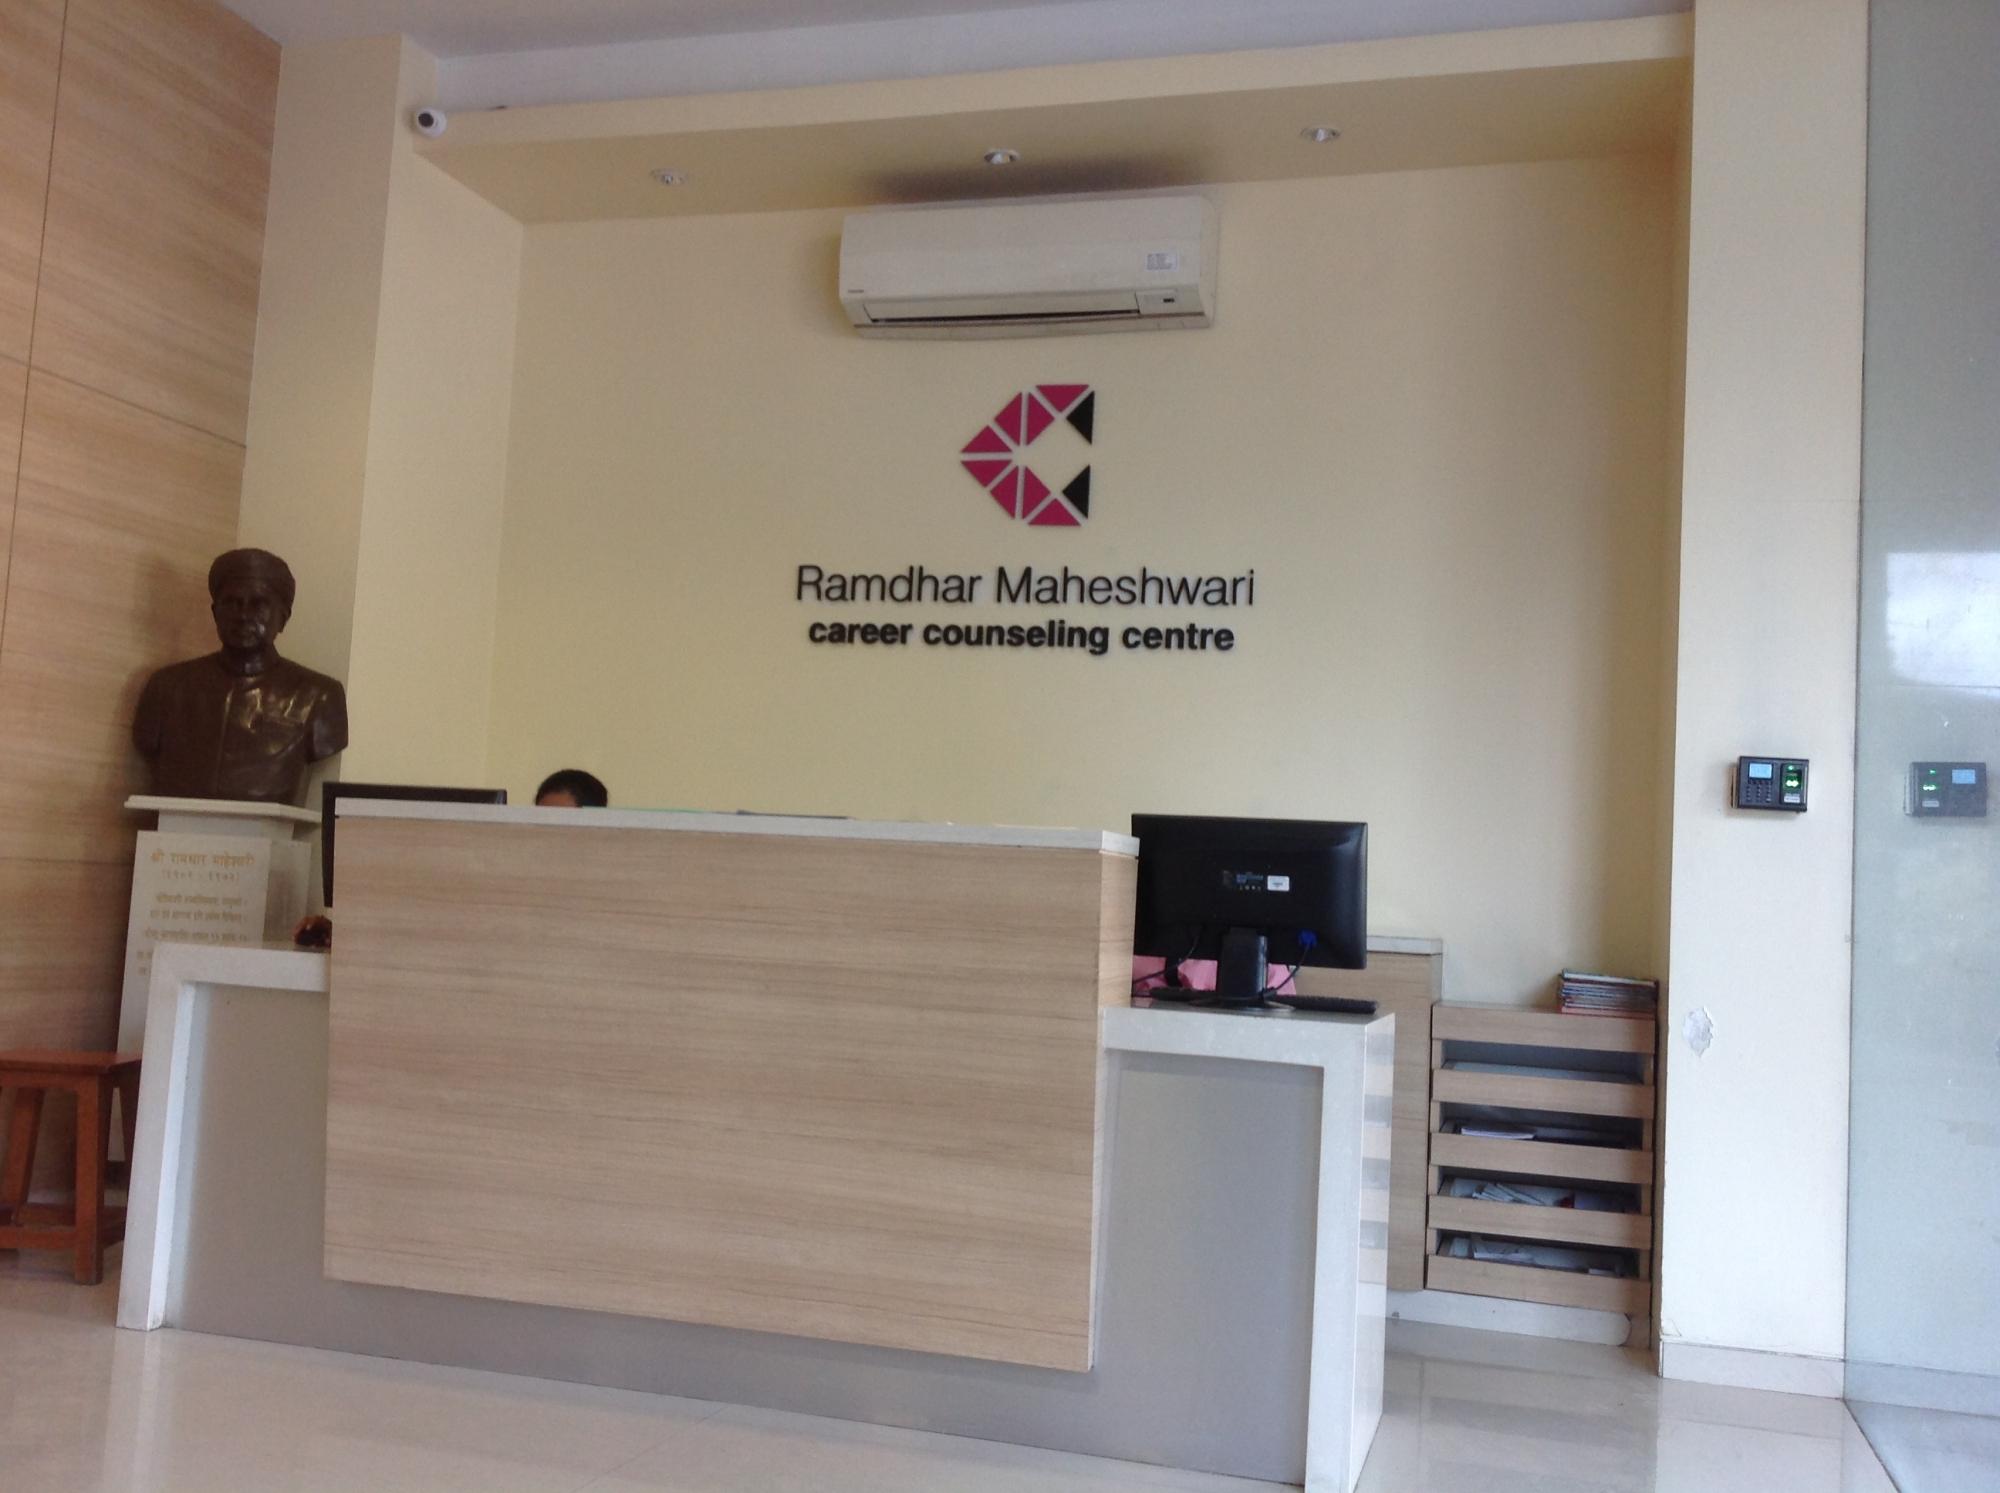 85 Interior Design Career Counseling Ramdhar Maheshwari Career Counseling Centre Malad